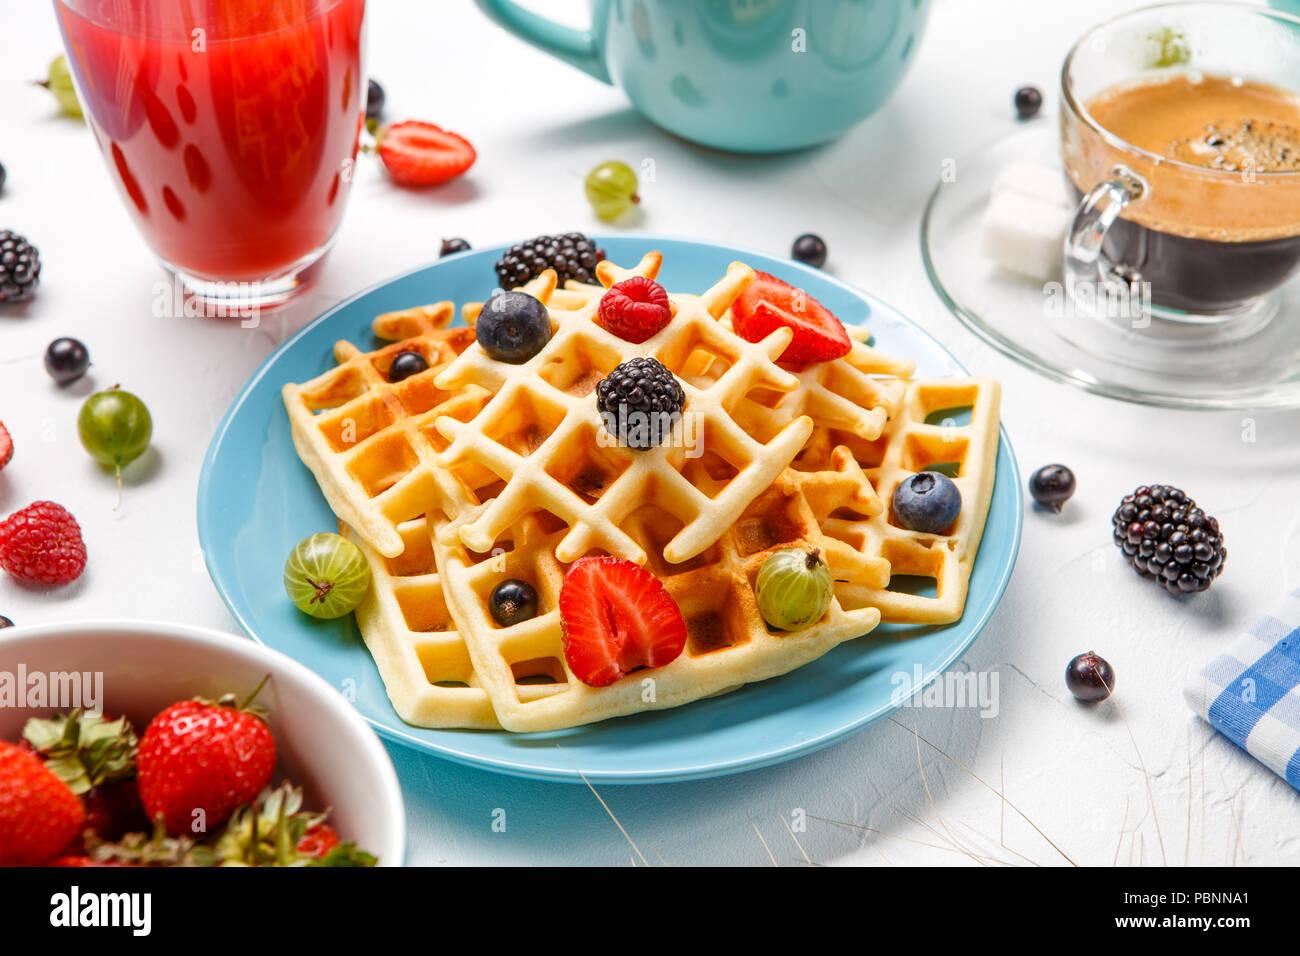 Photo of Viennese wafers, compote, coffee, raspberries, strawberries, gooseberries, cherries - Stock Image